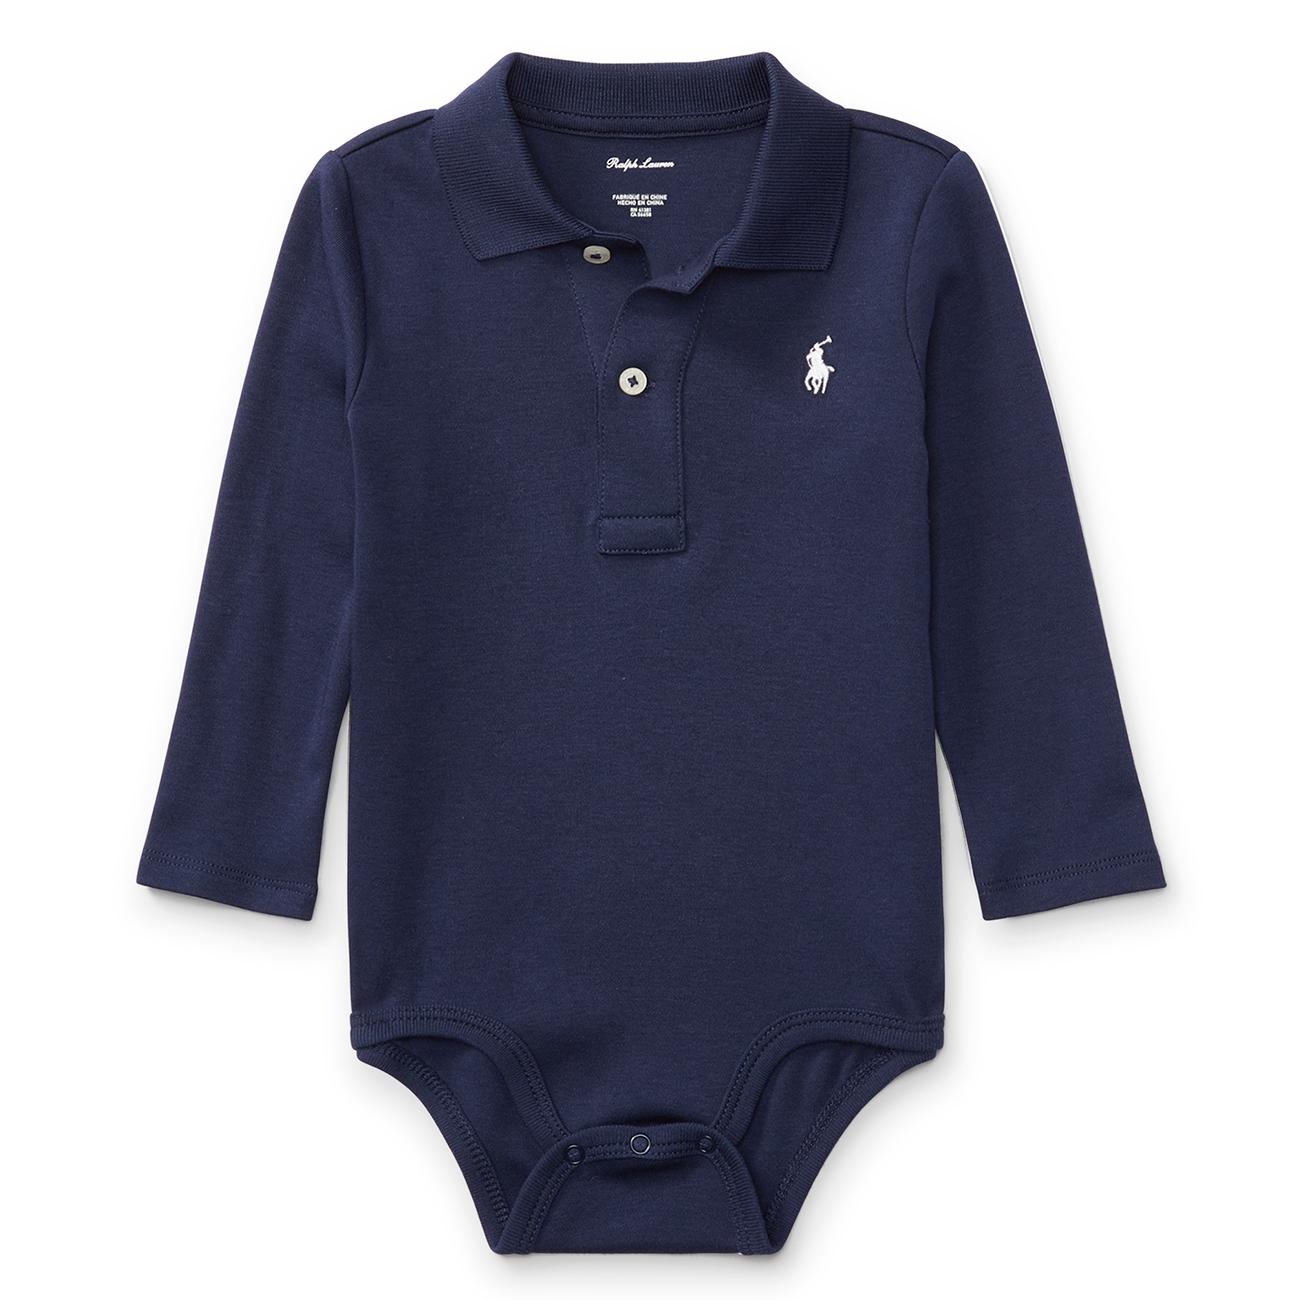 33517208 Ralph Lauren Baby Boy Long Sleeved Body French Navy